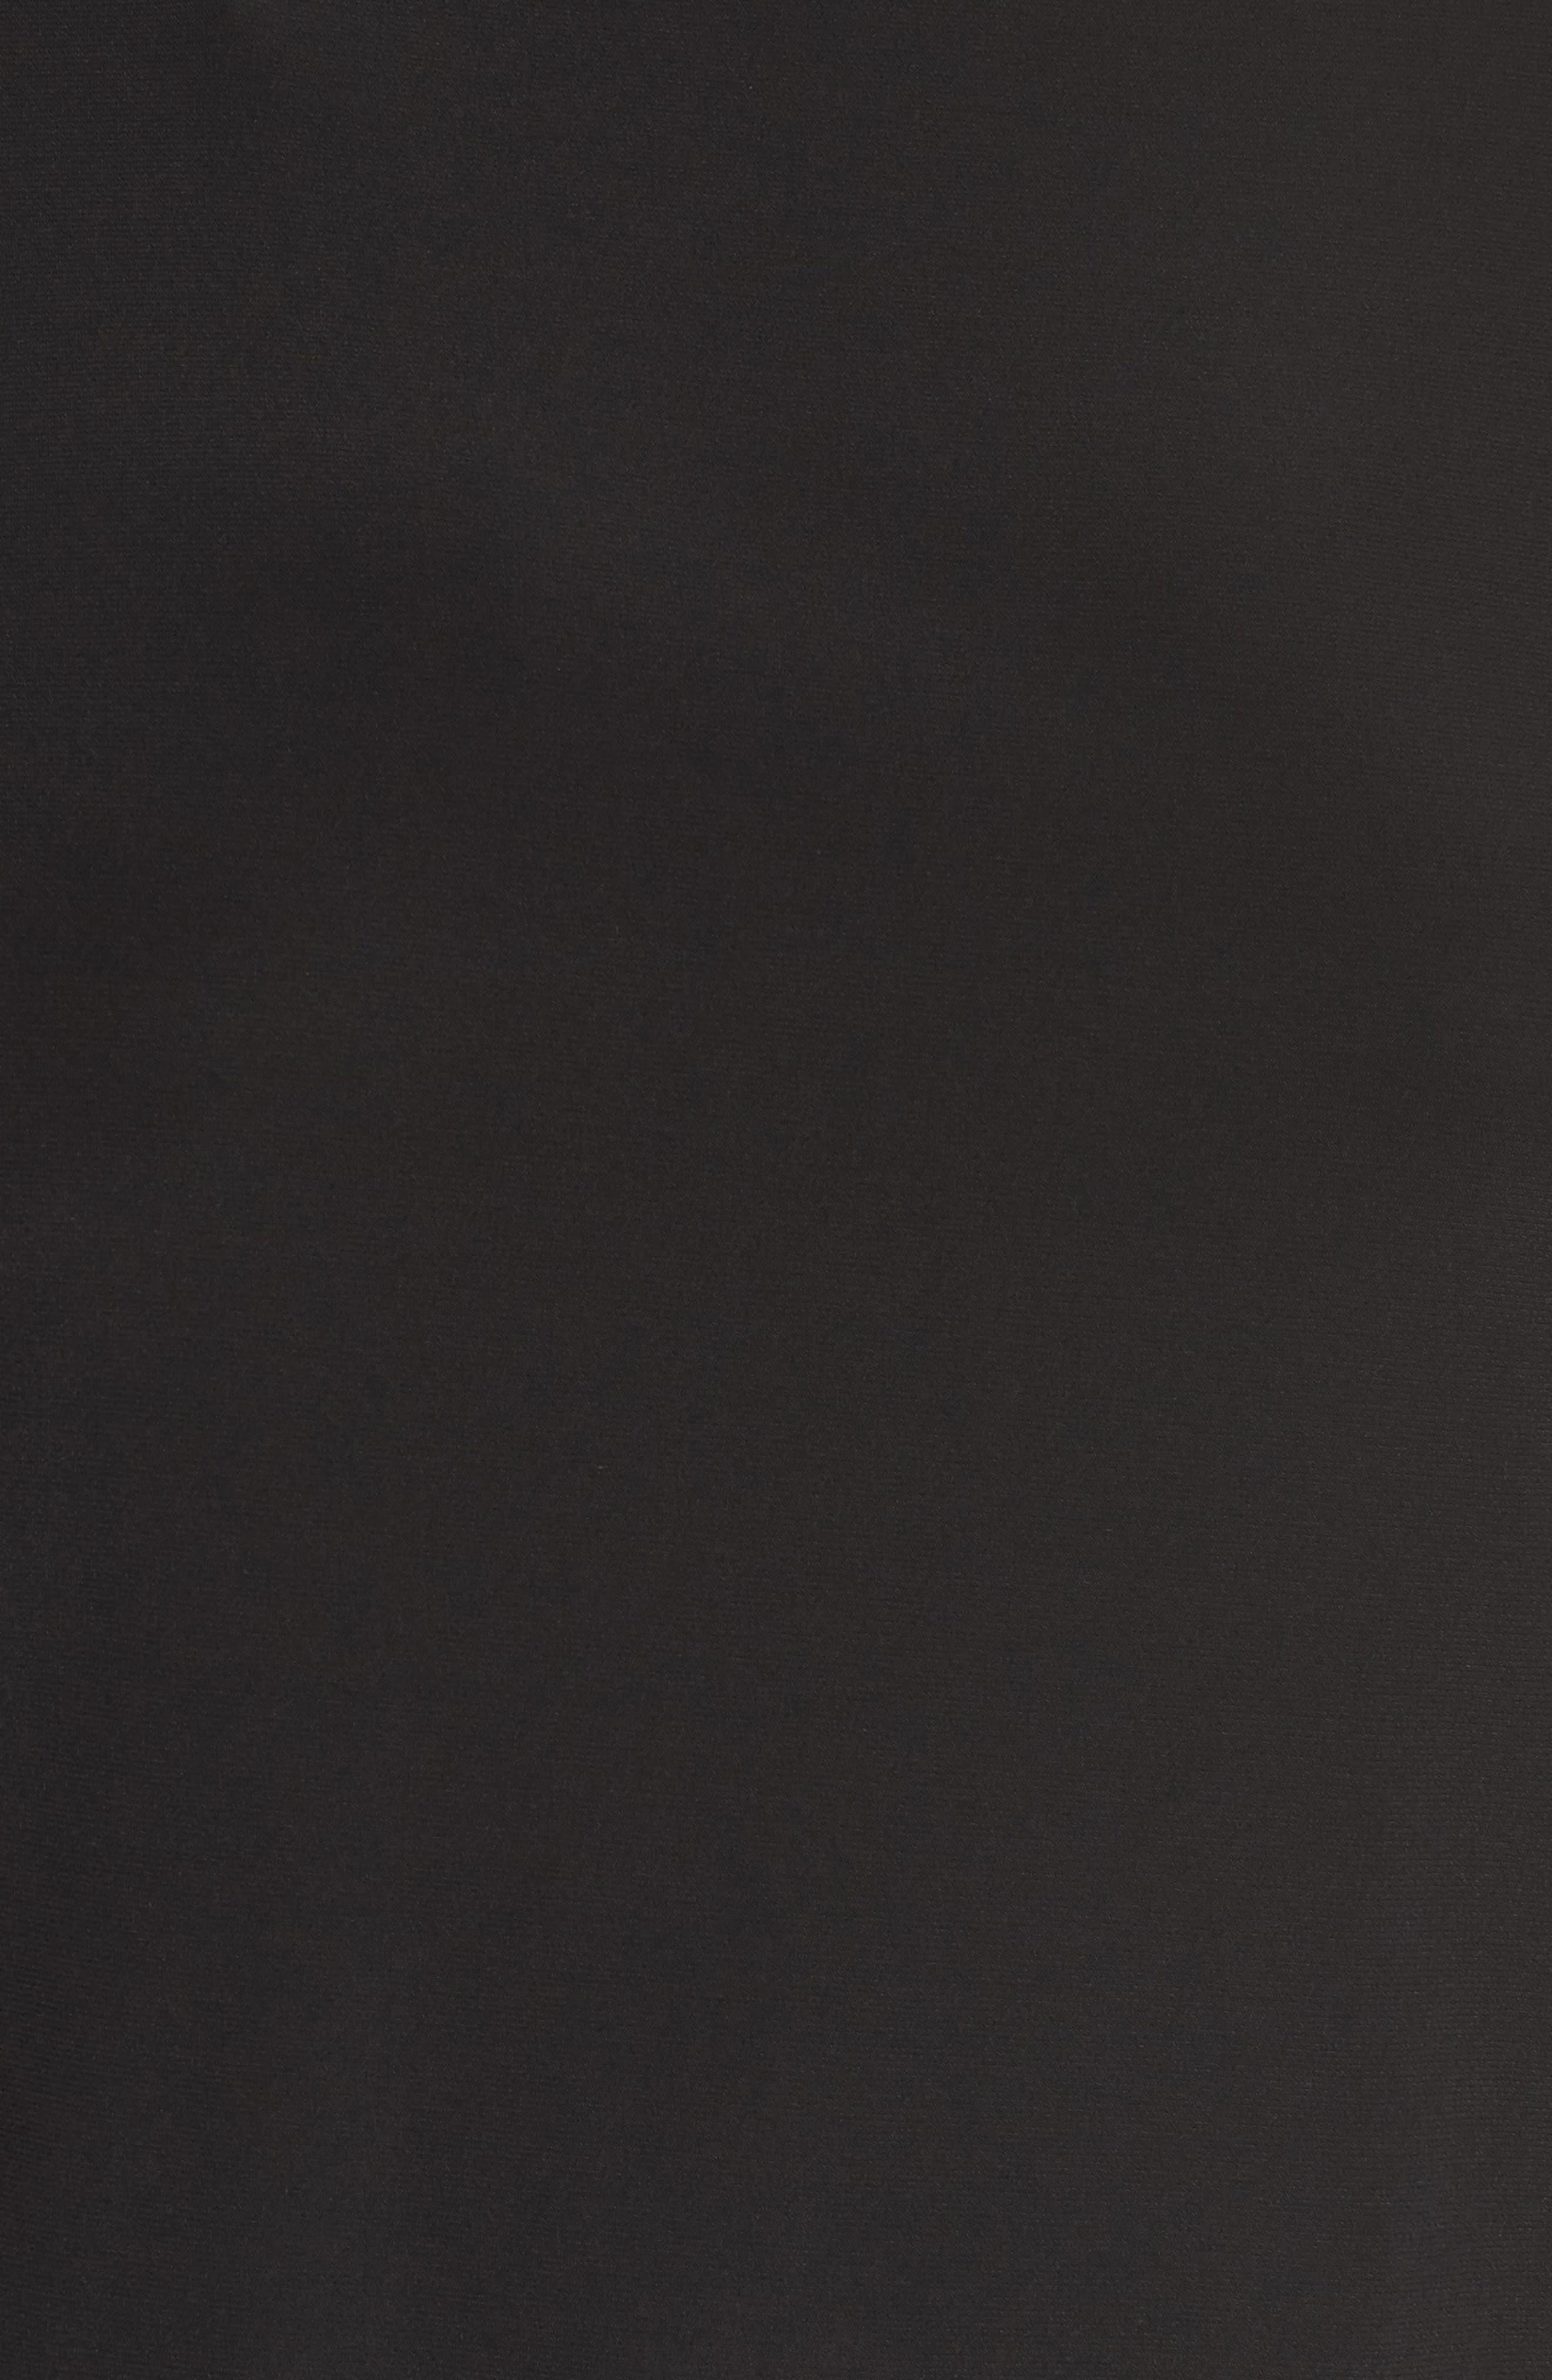 Embellished Cuff Blouson Jersey Dress,                             Alternate thumbnail 7, color,                             BLACK